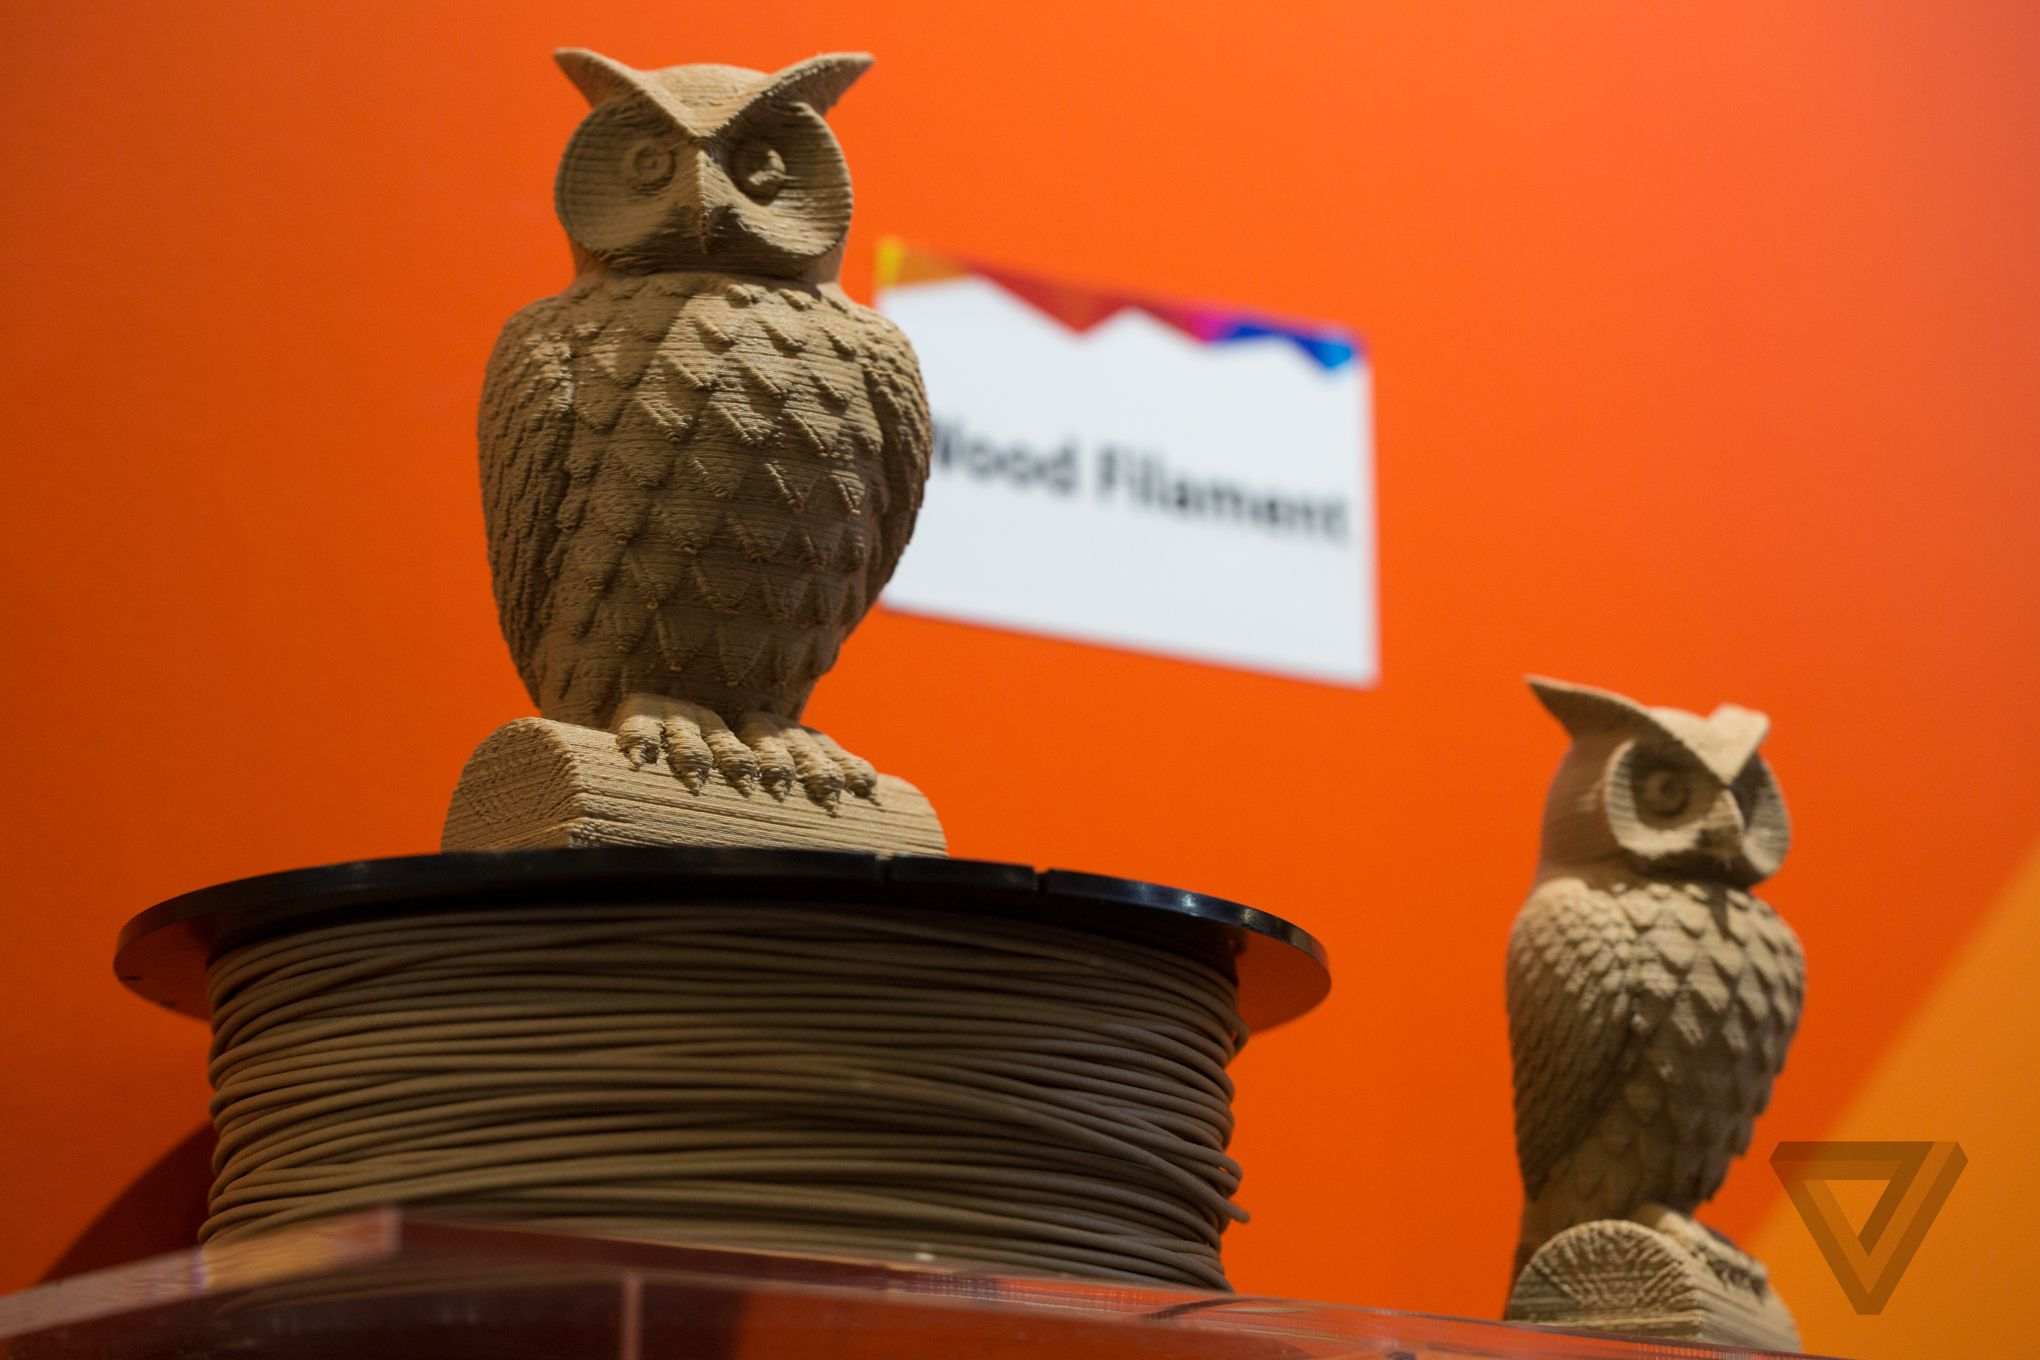 Wood filament 3d printing